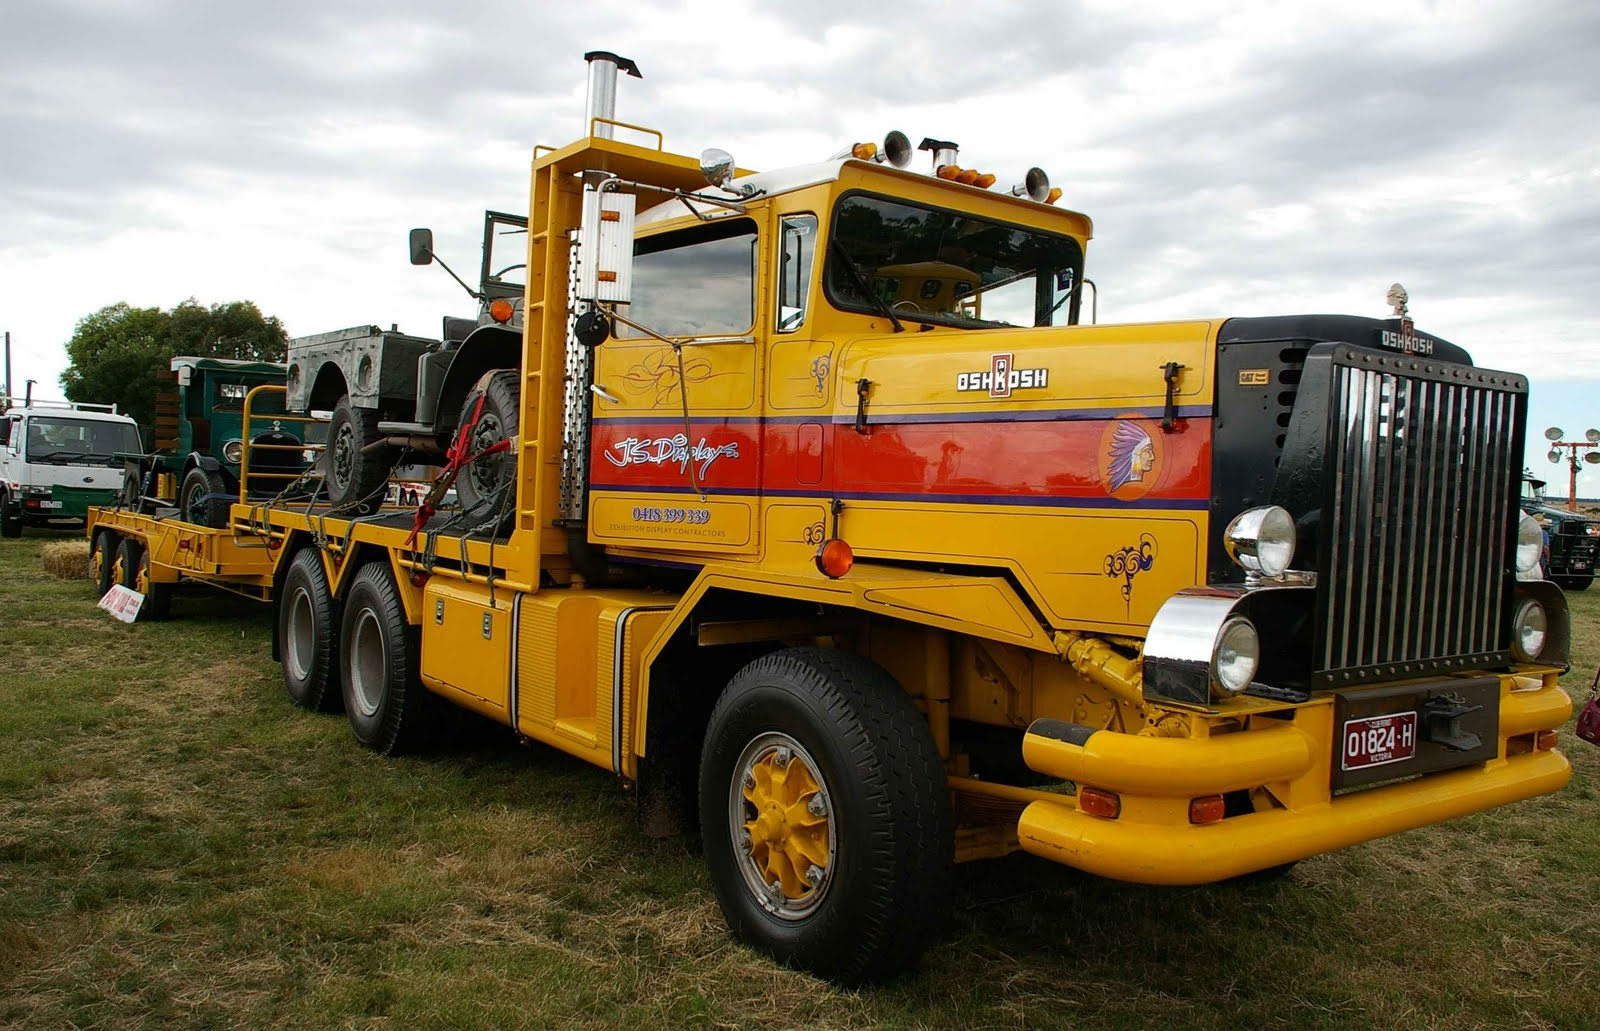 Historic trucks hcvc ballarat branch clunes truck show for Hayes motor company trucks